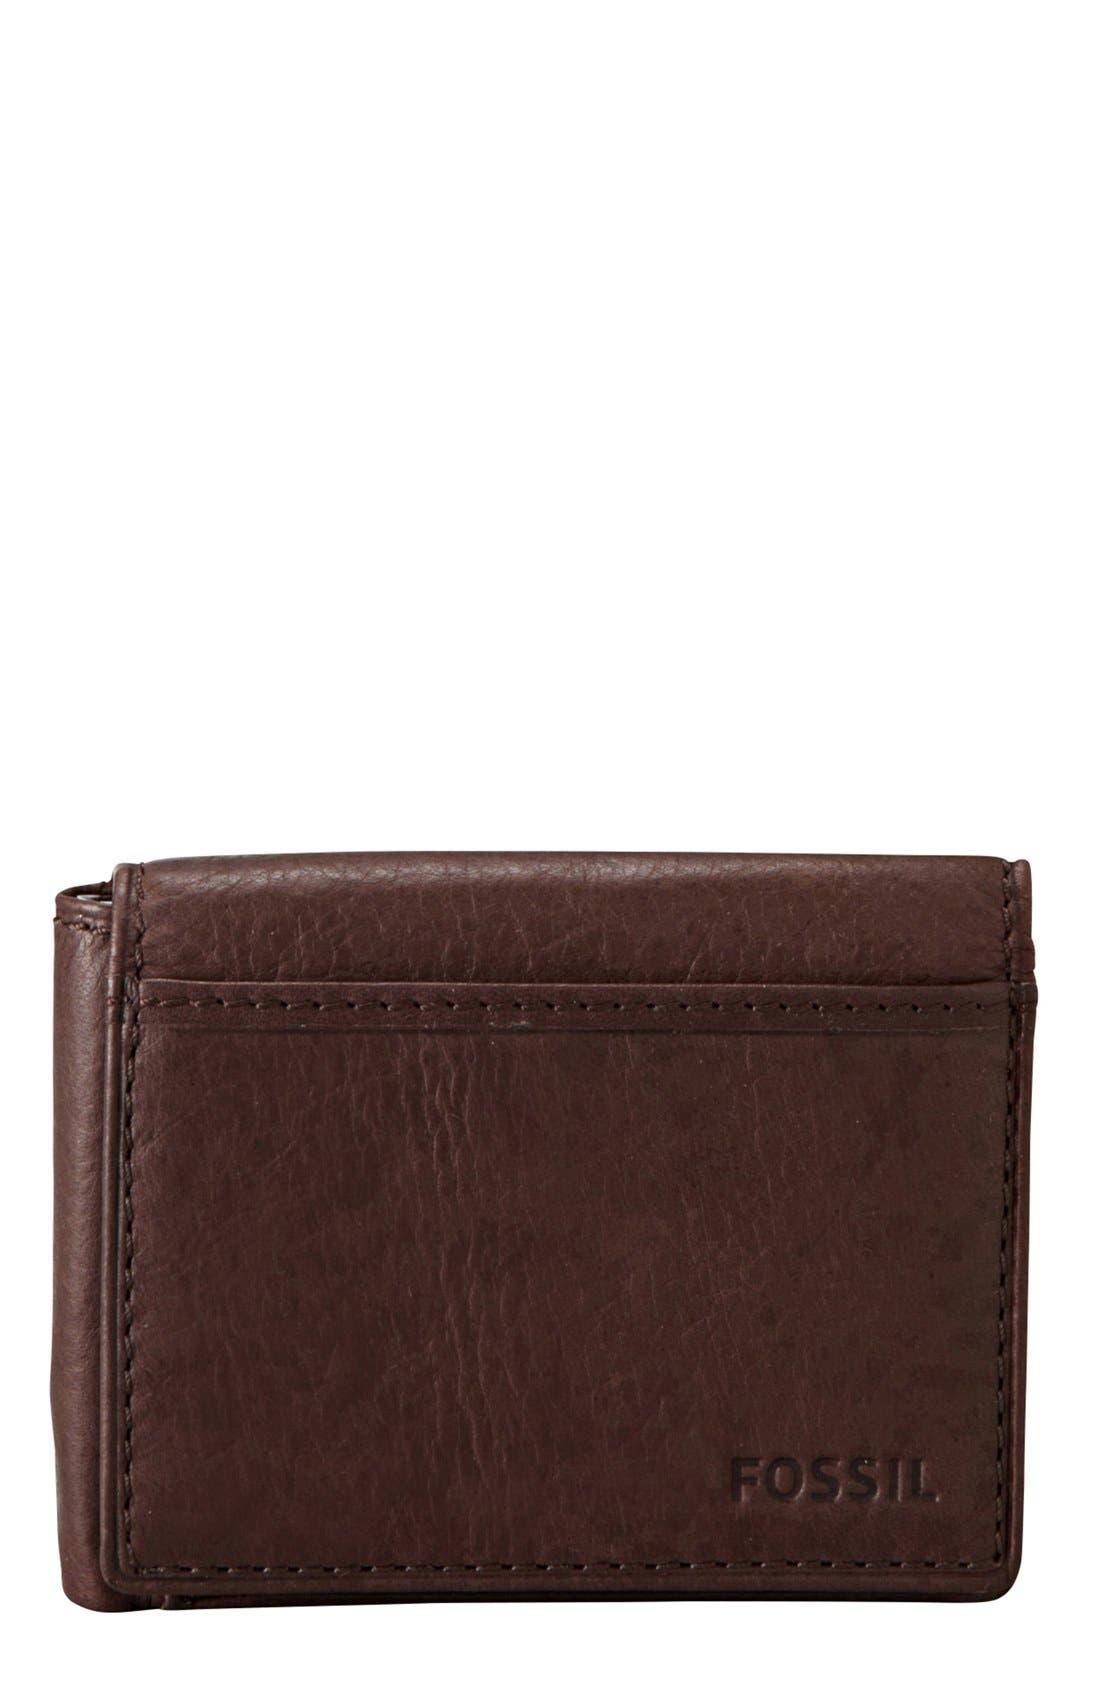 Alternate Image 1 Selected - Fossil 'Ingram' Leather Flip Trifold Wallet